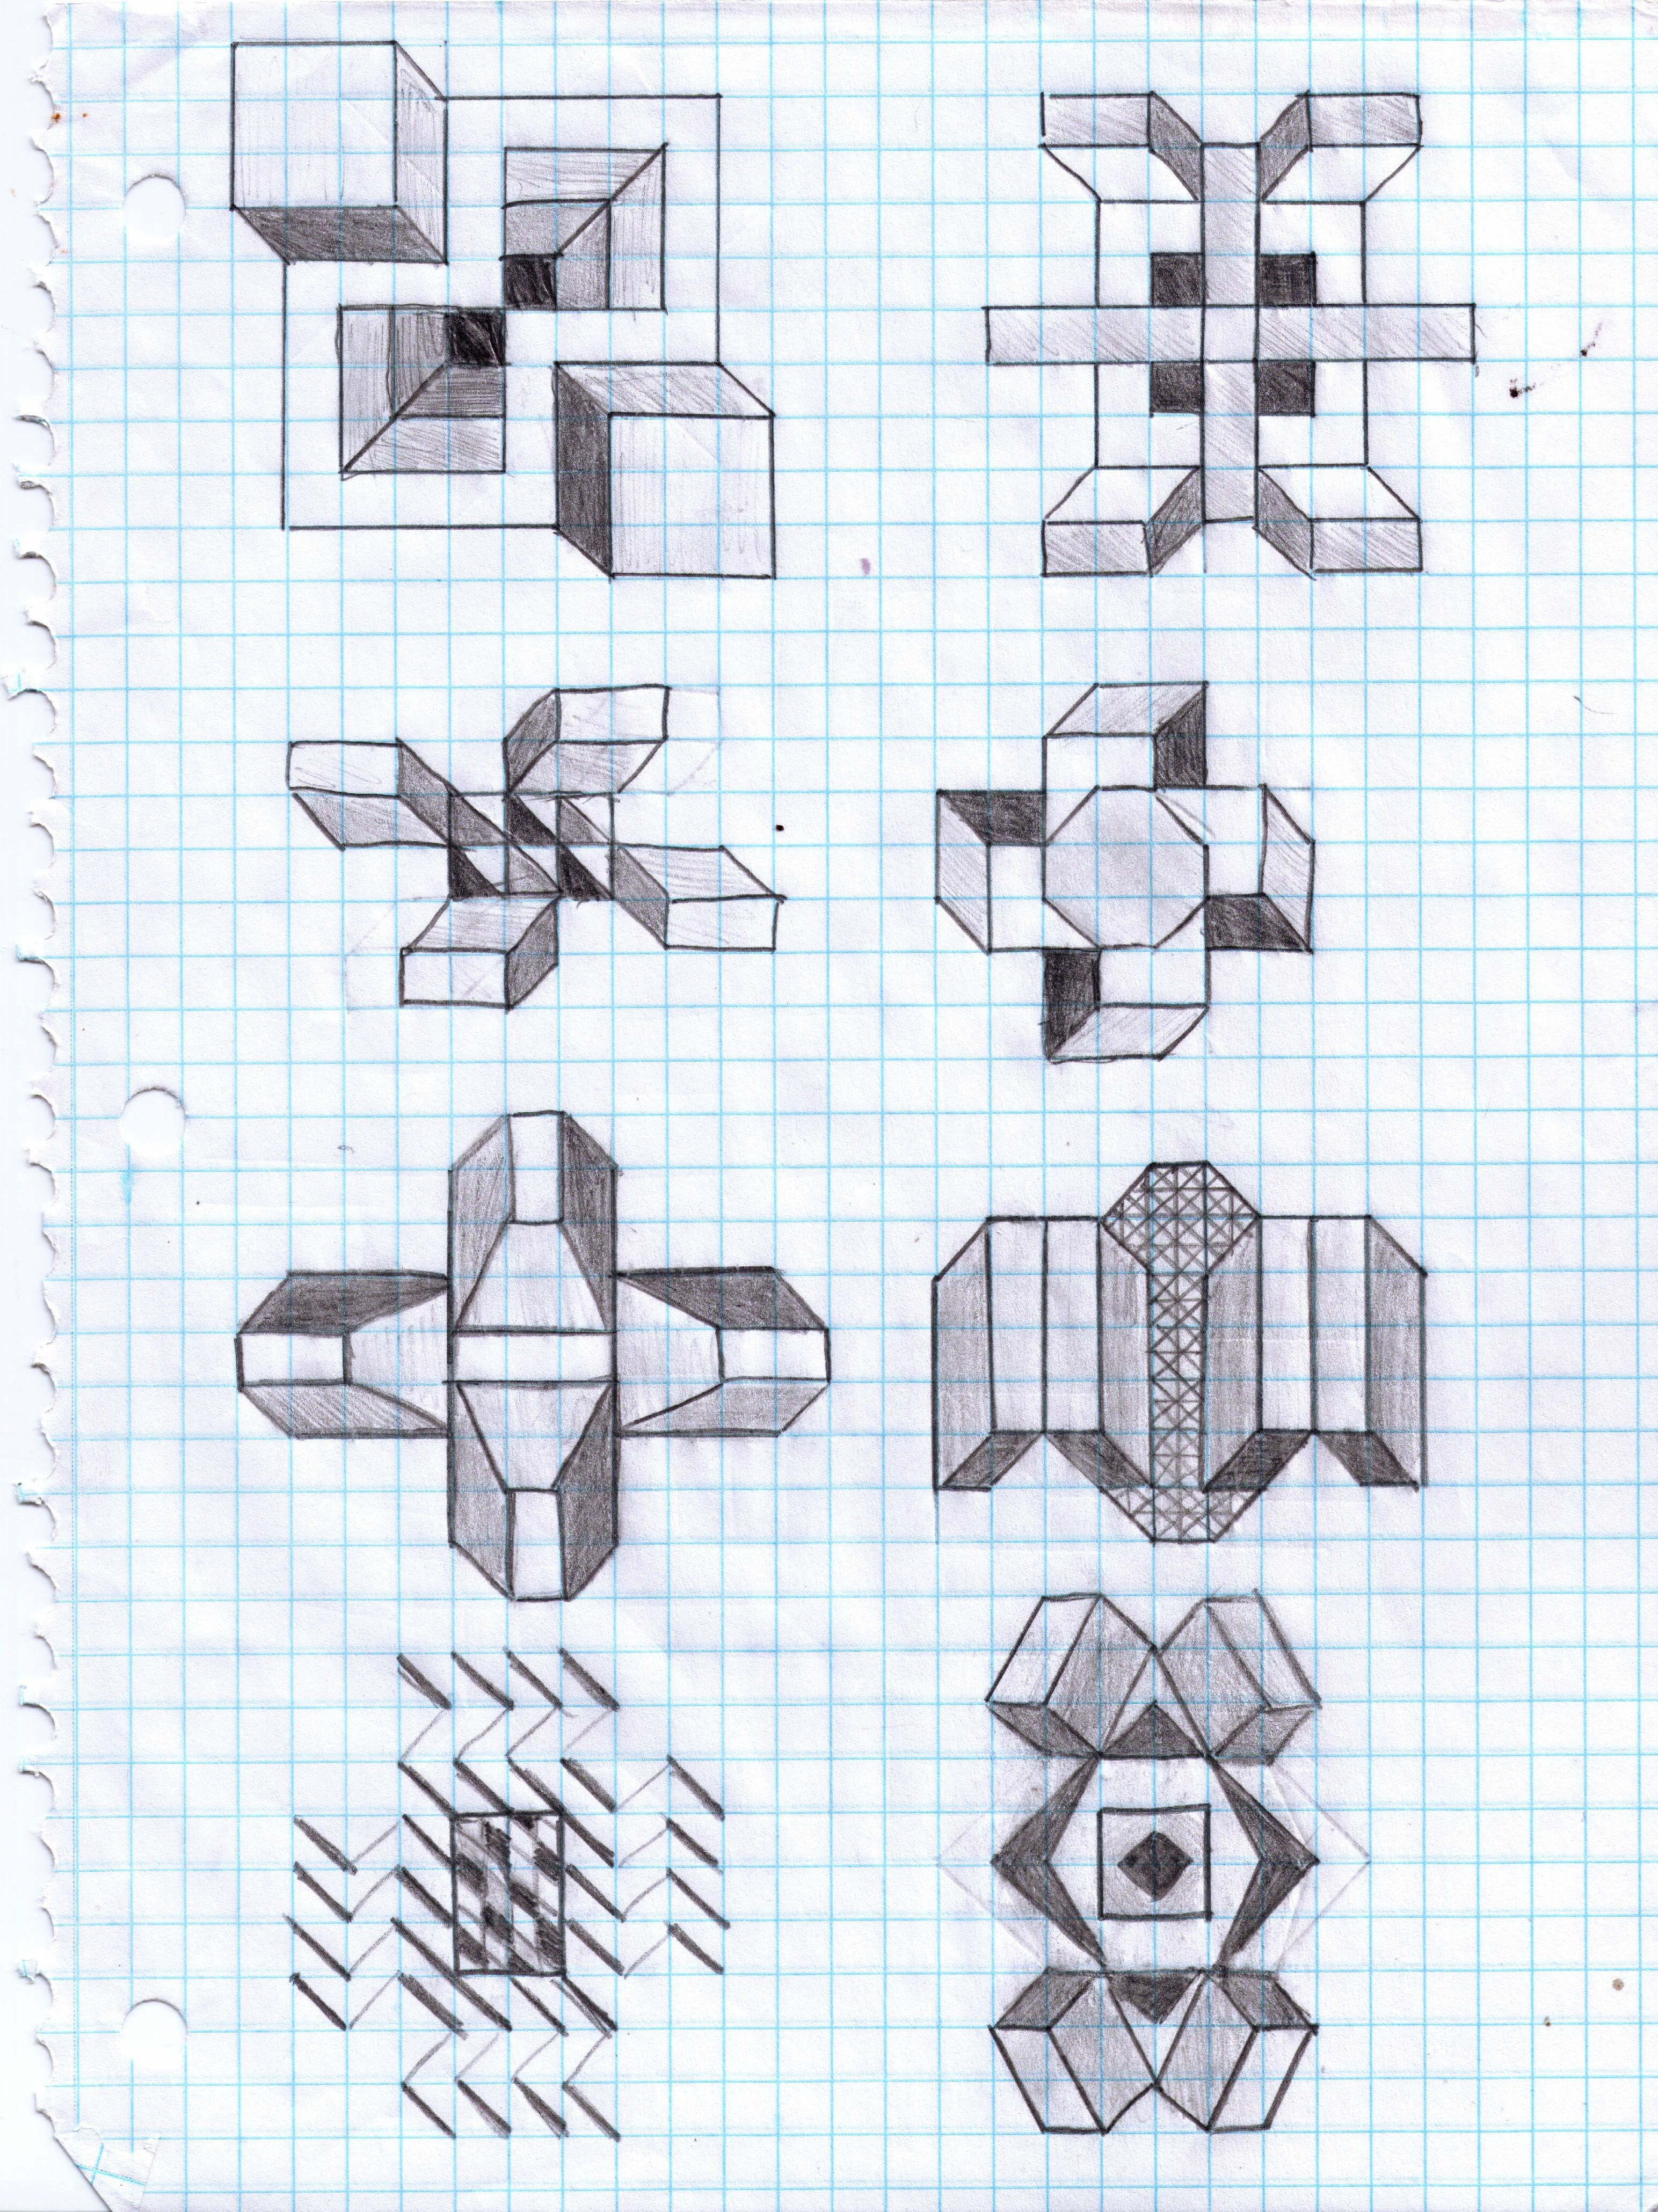 graph paper drawing at getdrawings